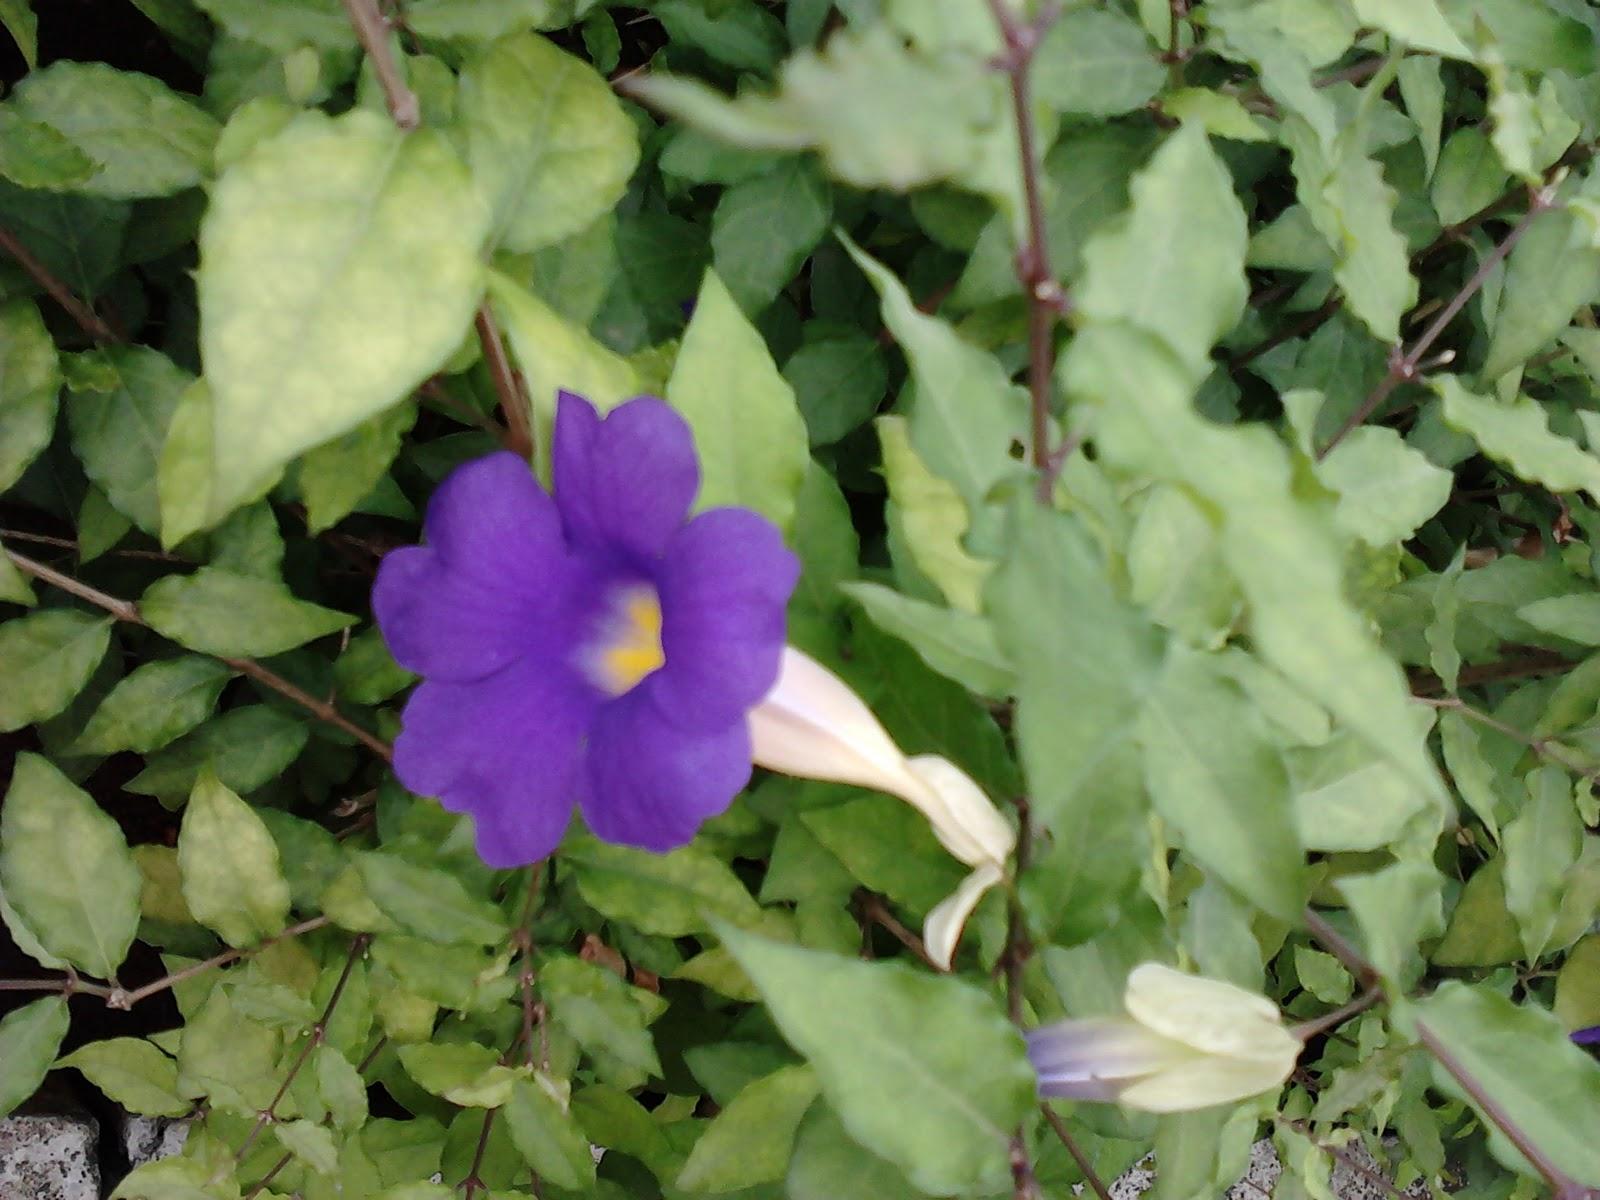 Garden Care Simplified 2 Easy Growing Purple Flowering Plants